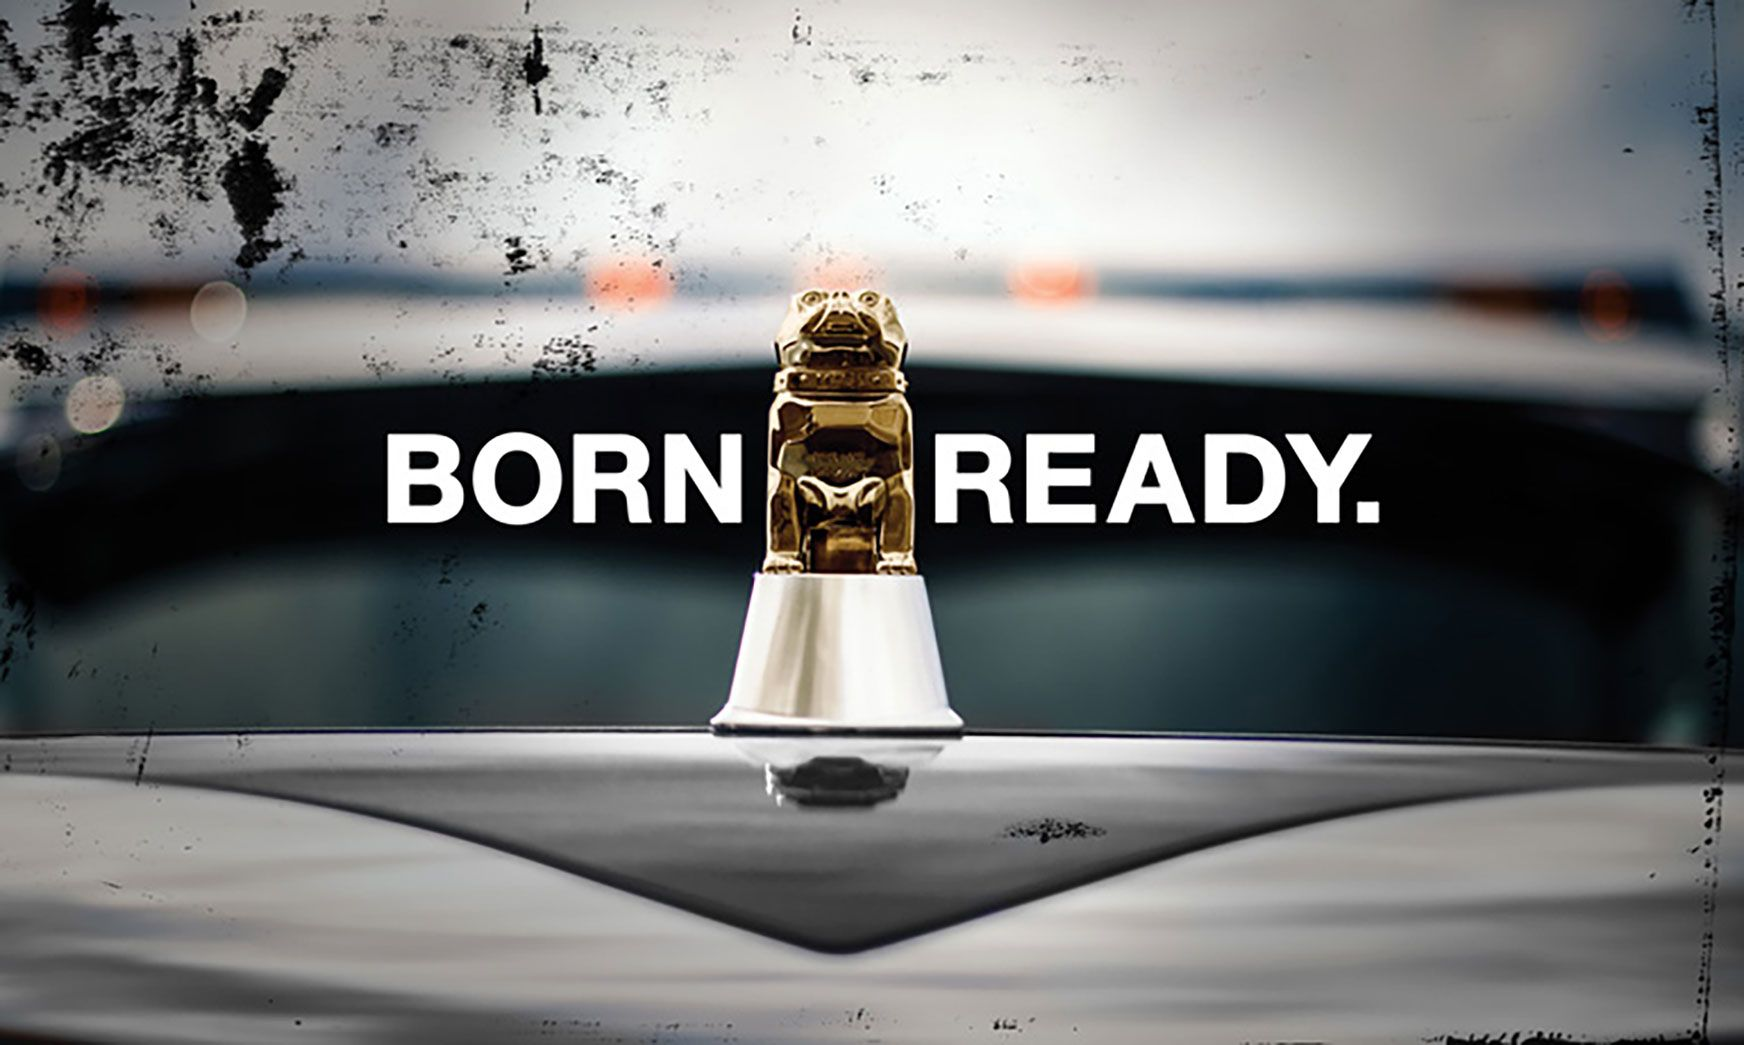 Mack Trucks - Born Ready.